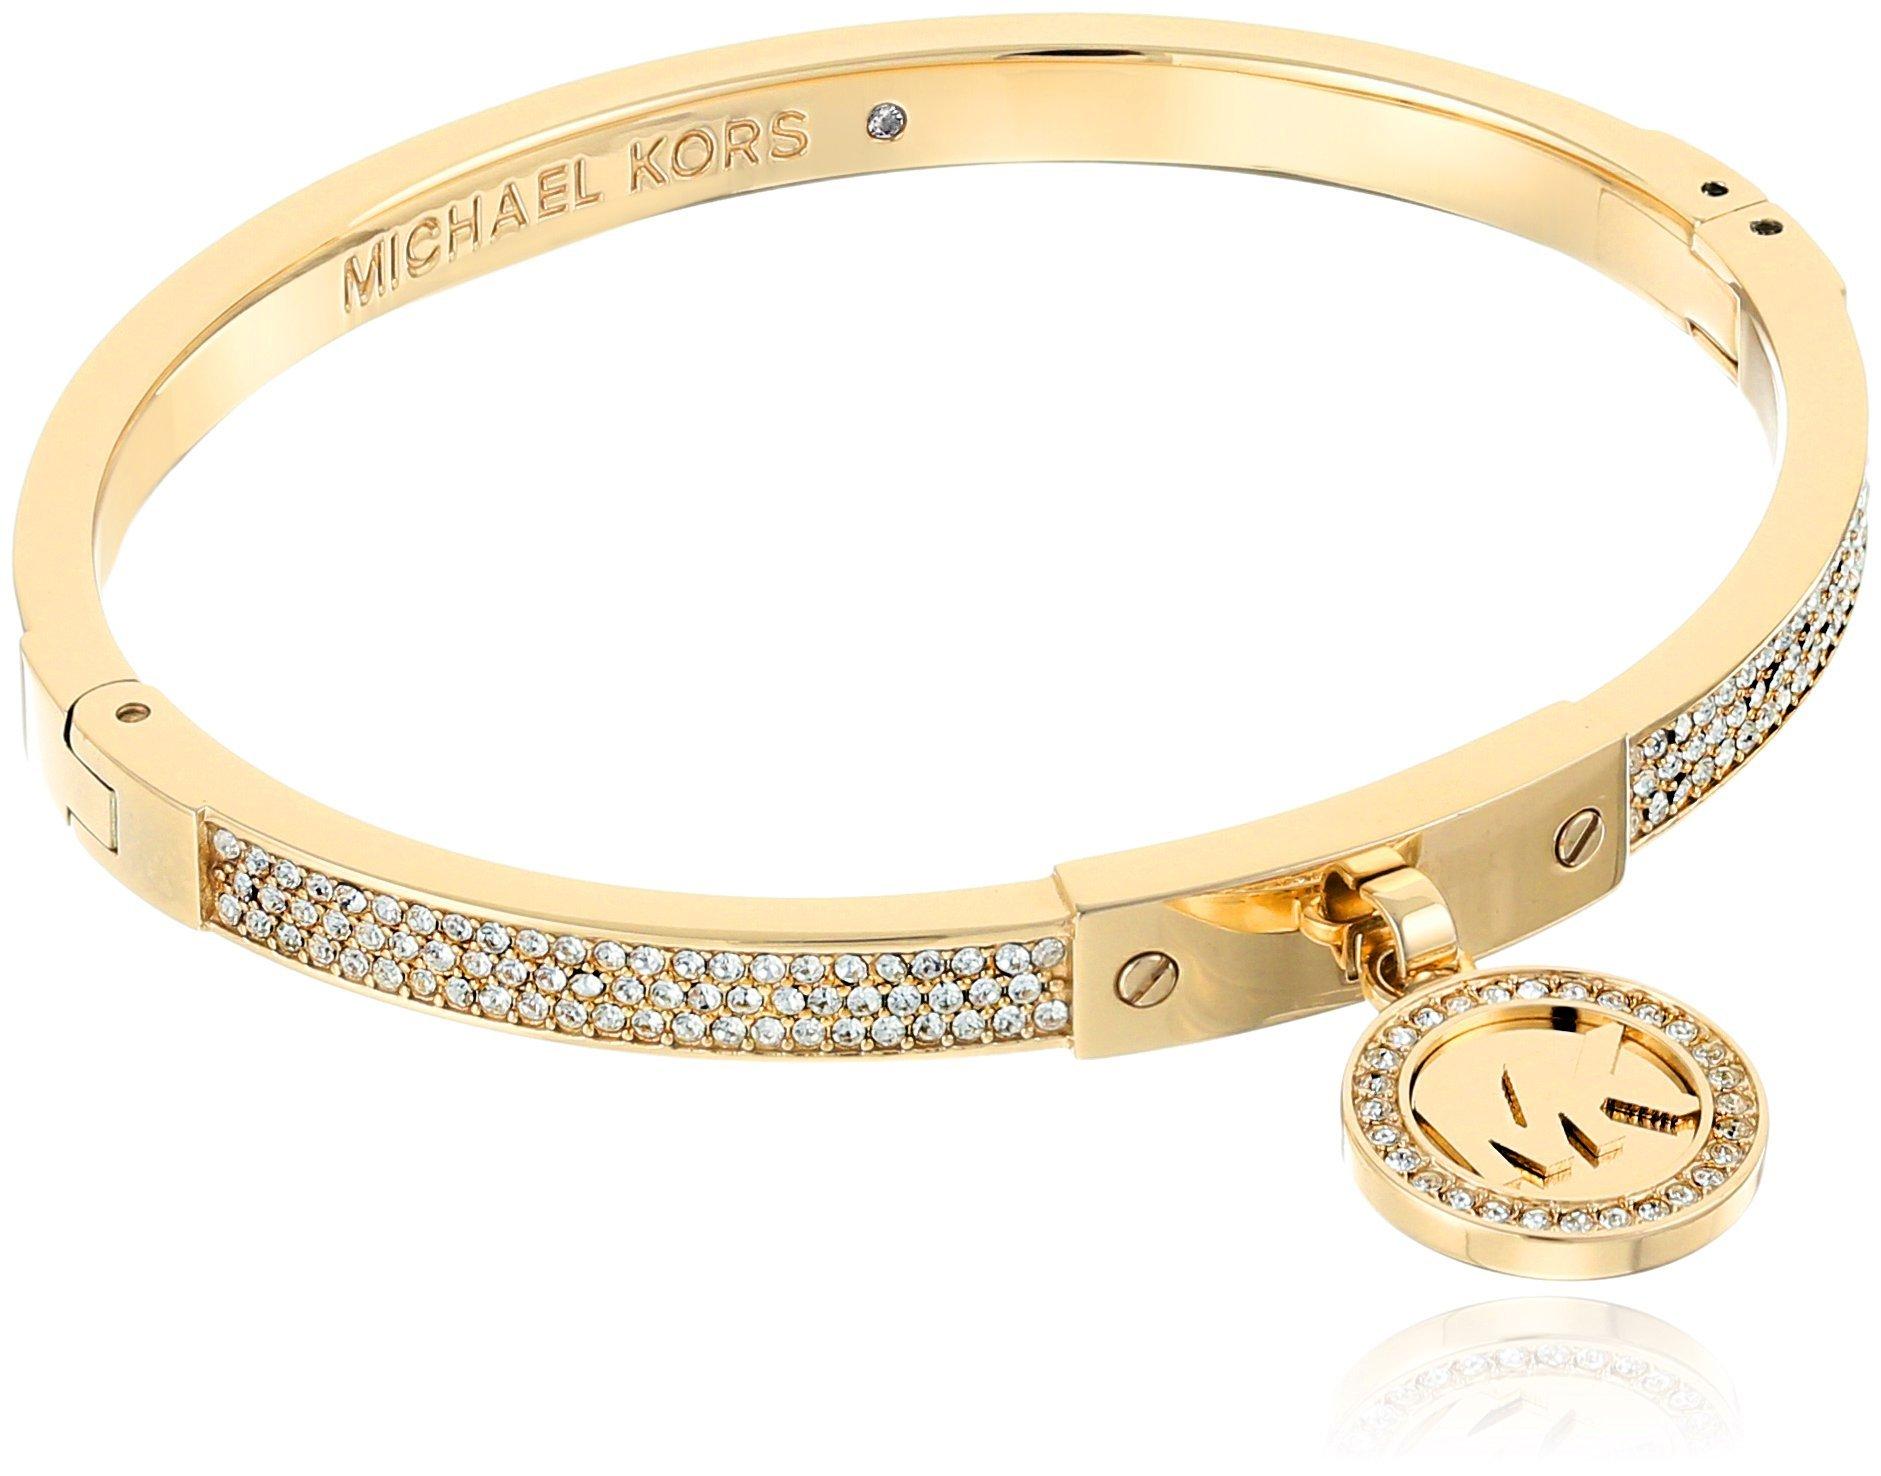 Michael Kors Gold Tone Fulton Hinge Bangle Bracelet by Michael Kors